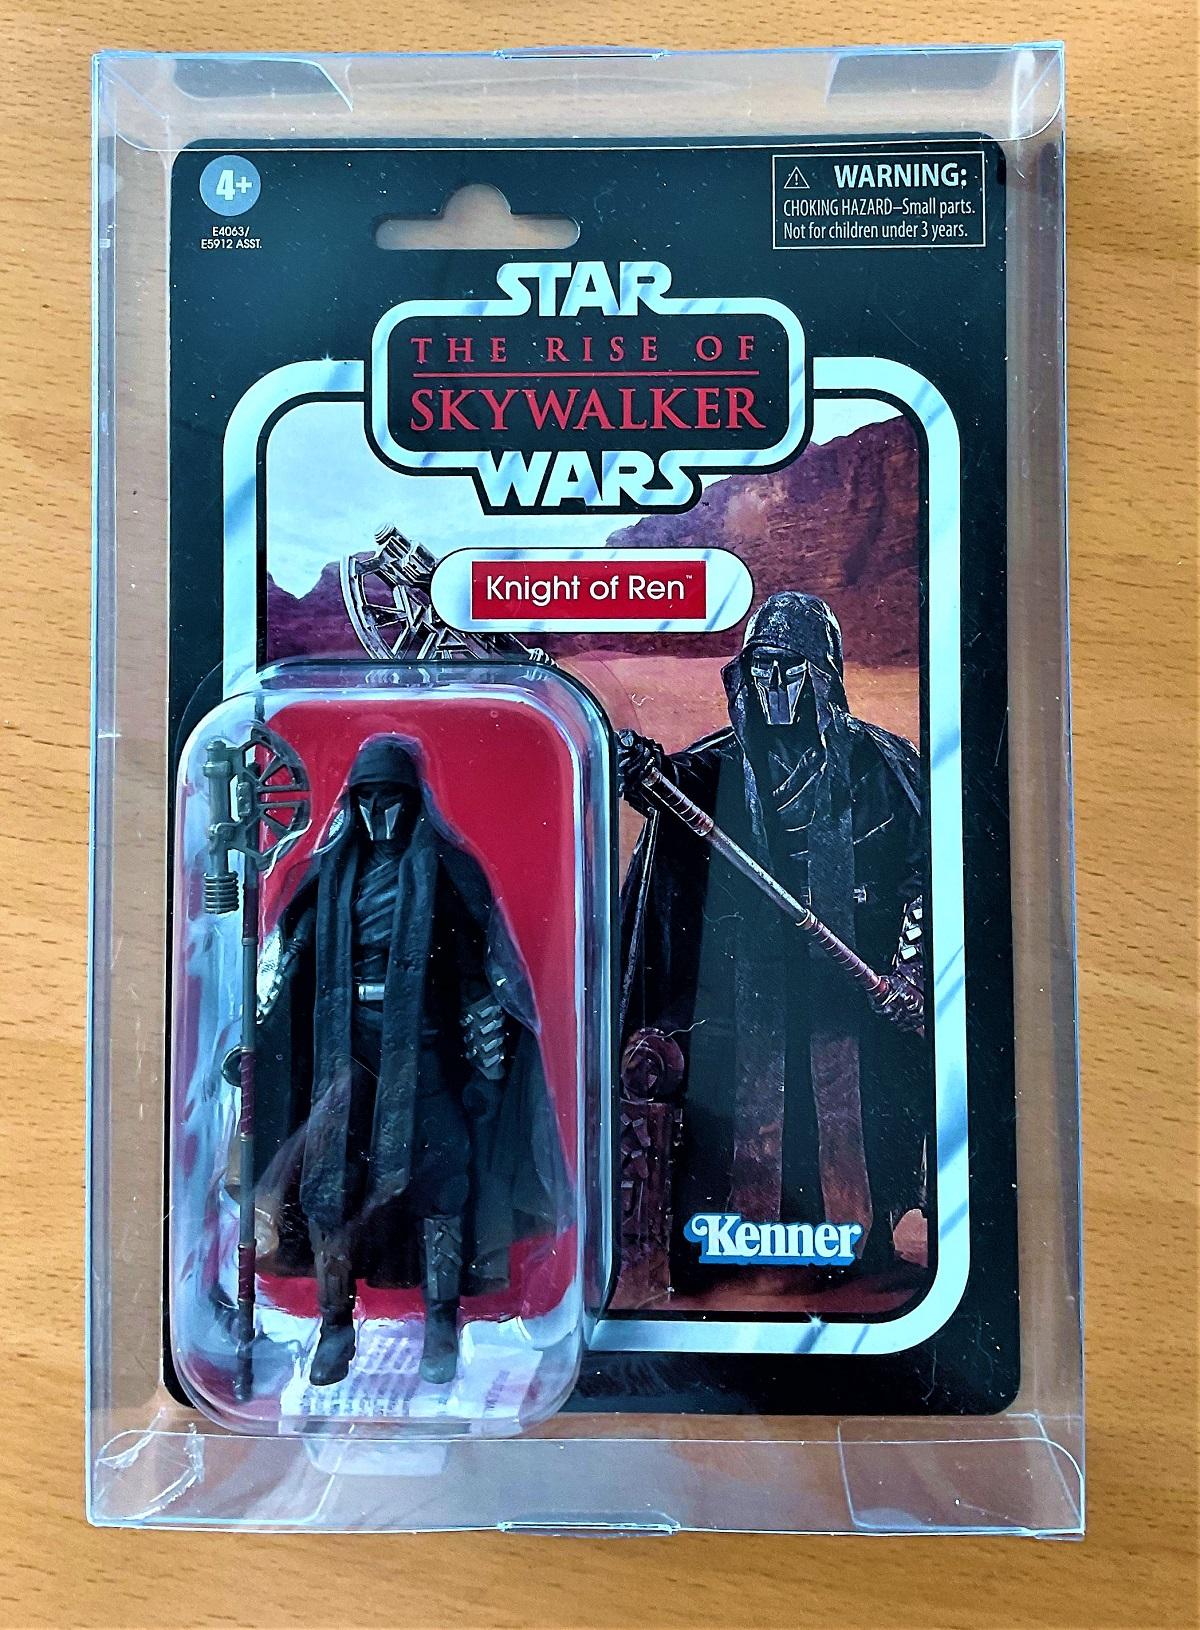 Star Wars, miniature action figure of Knight of Ren taken from Star Wars; The Rise of Skywalker.